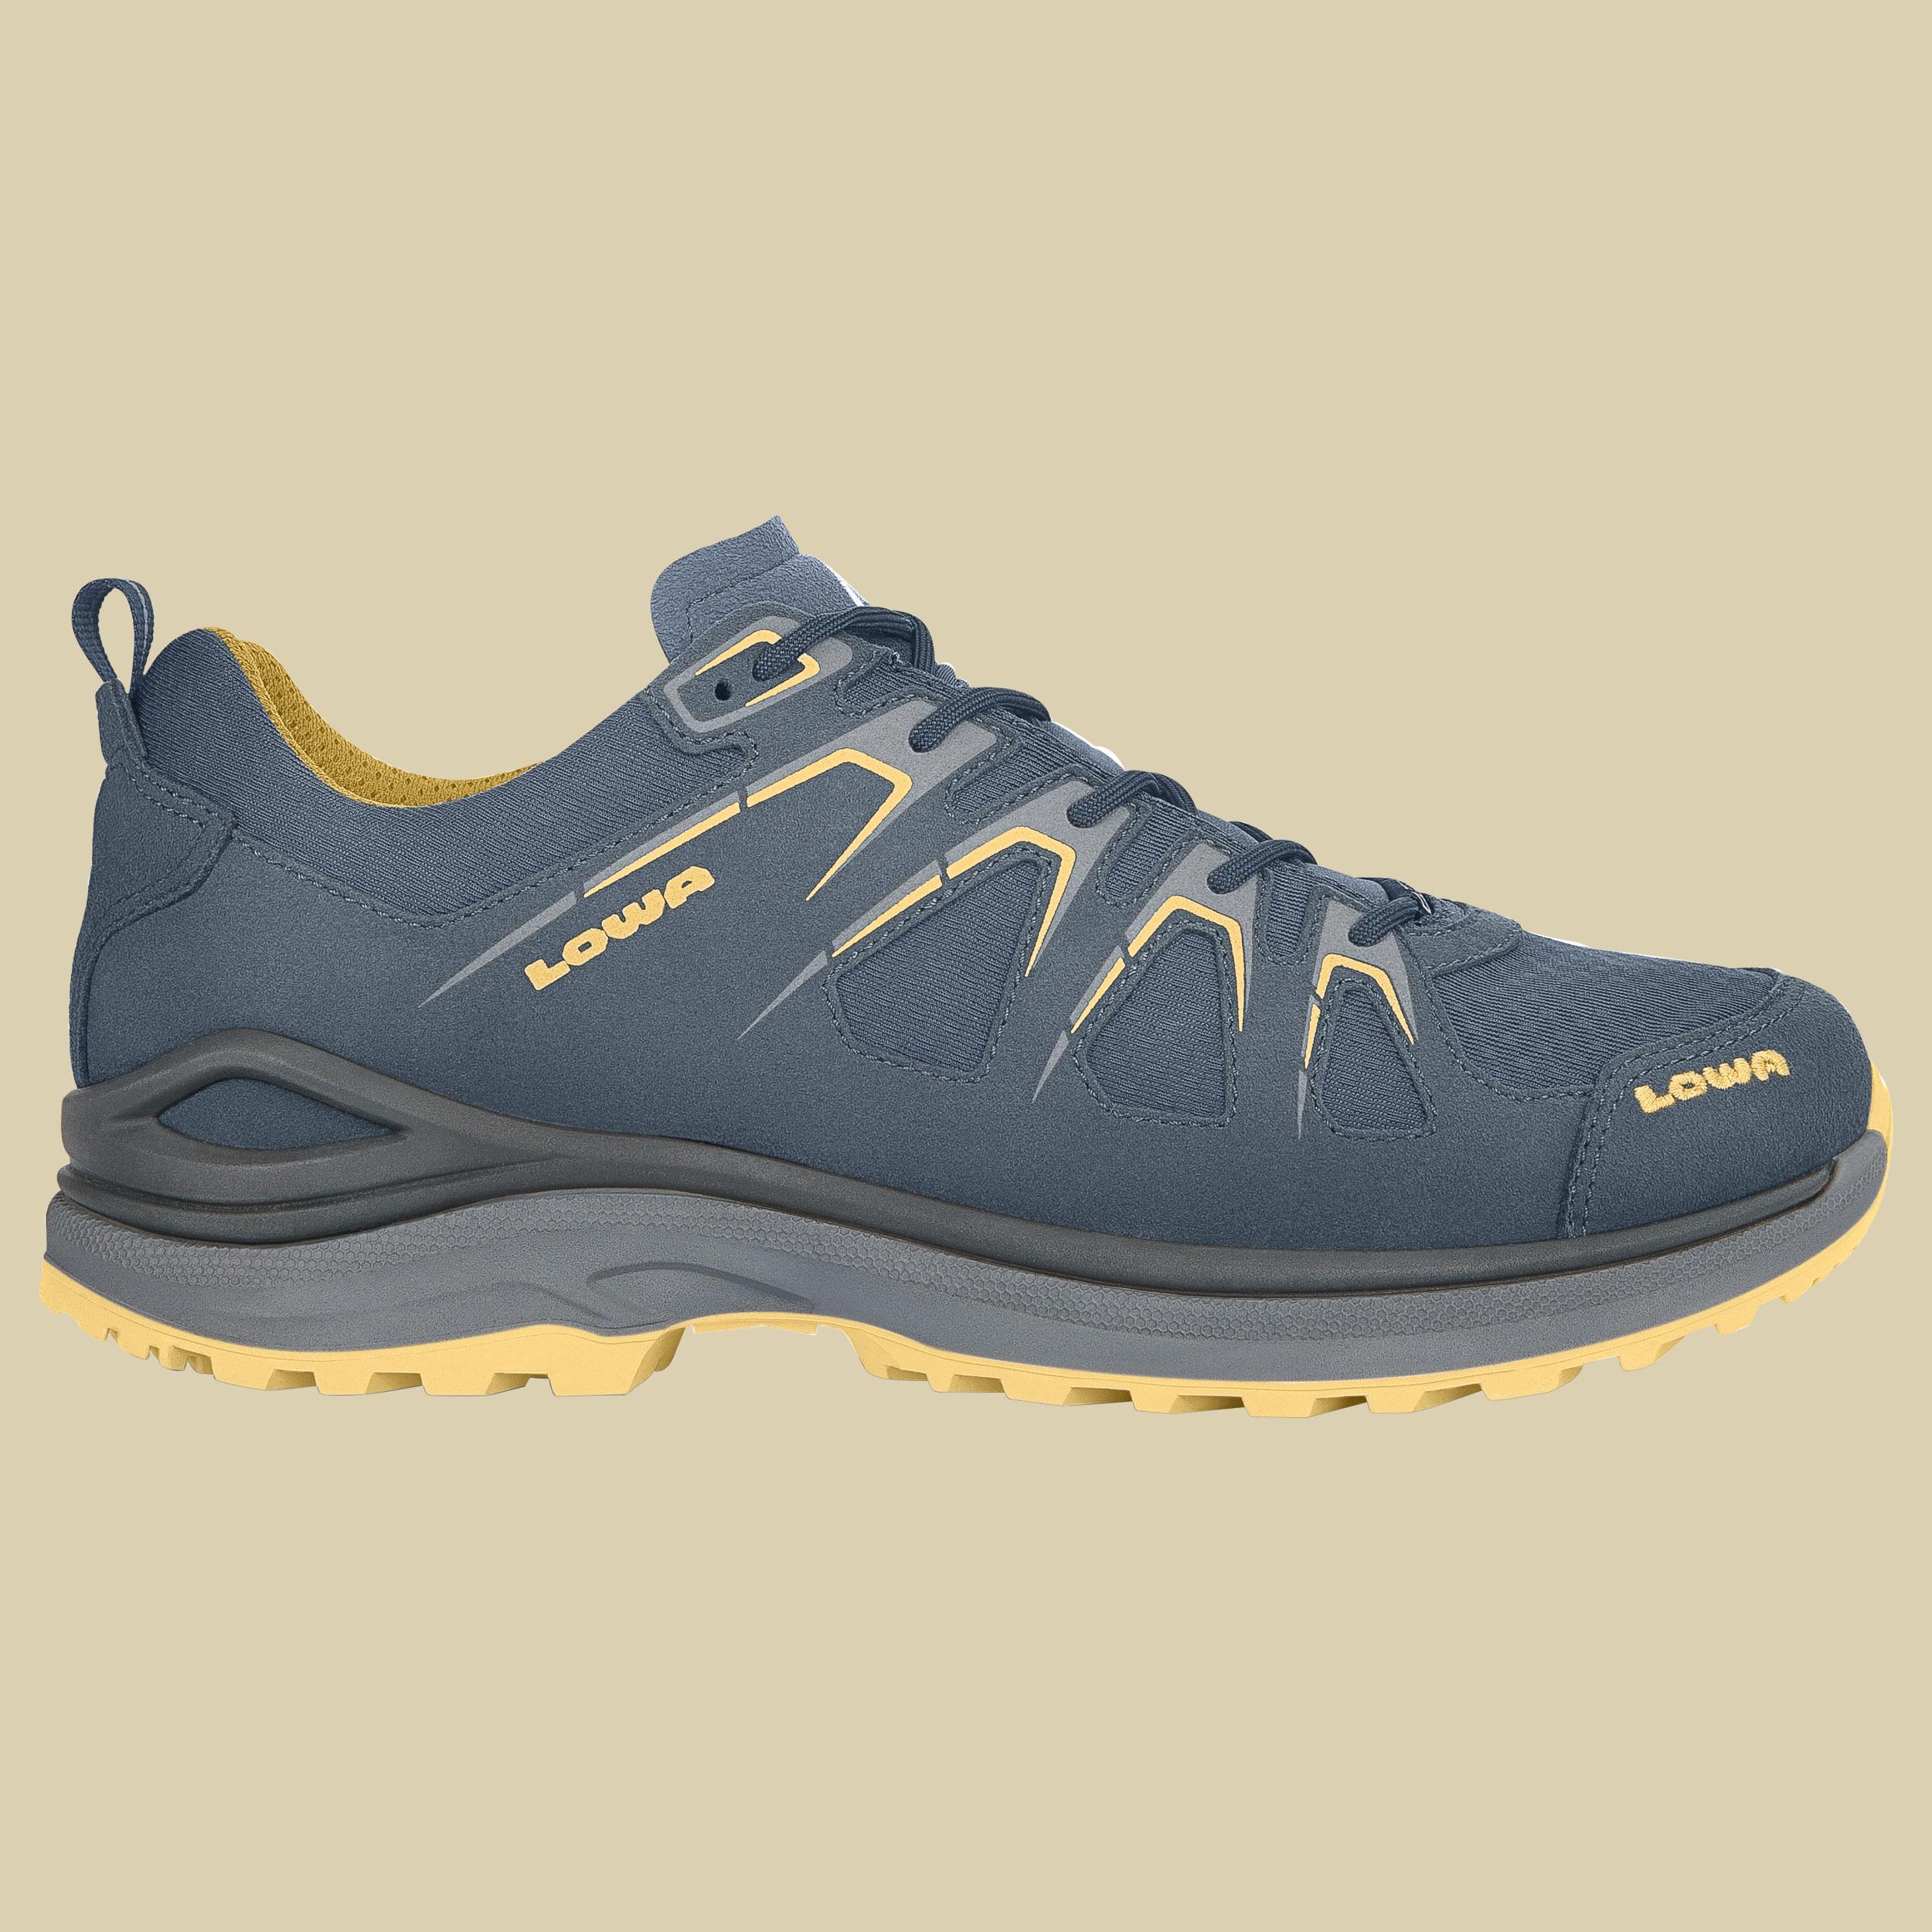 Lowa Innox Evo GTX Low Men Outdoor Fitness Schuh  Größe UK 11,5 stahlblau/senf